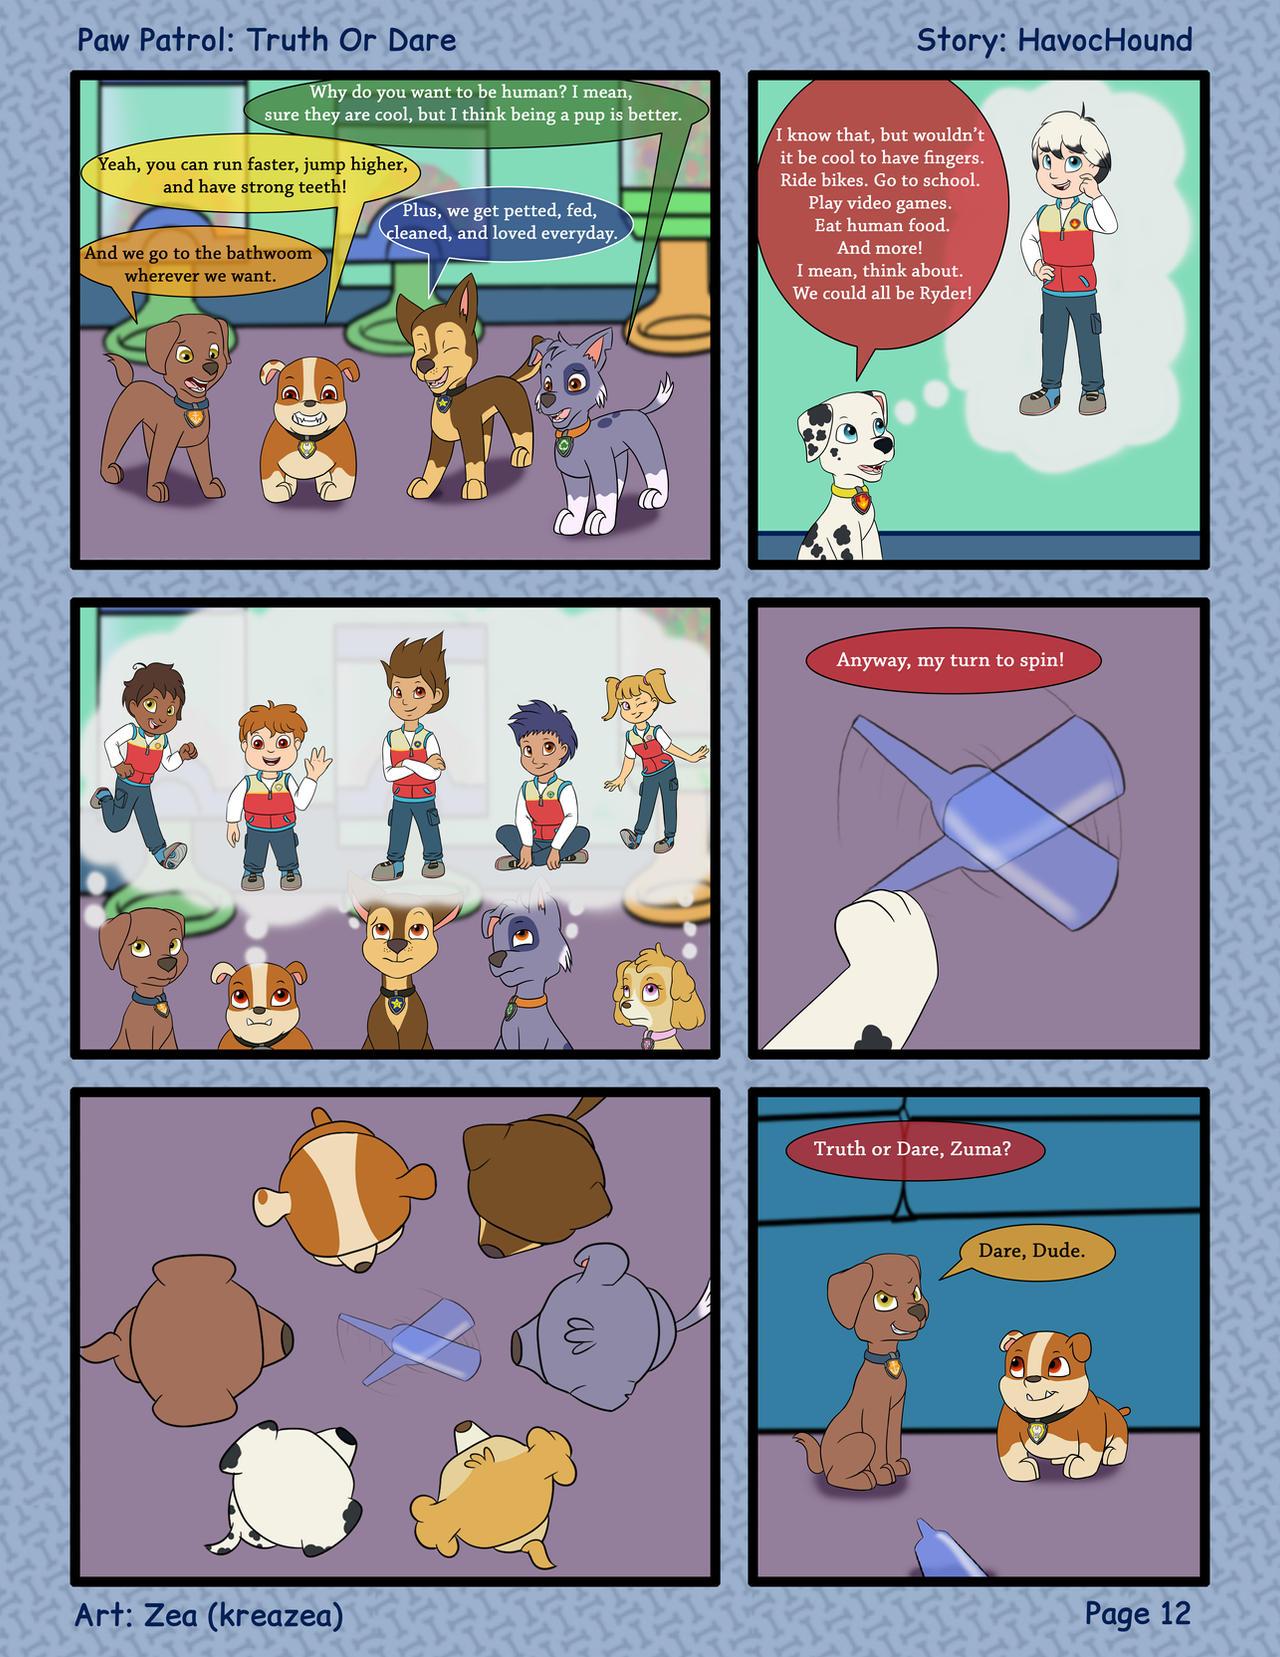 Paw Patrol Comic - Truth or Dare Pg 12 by kreazea on DeviantArt